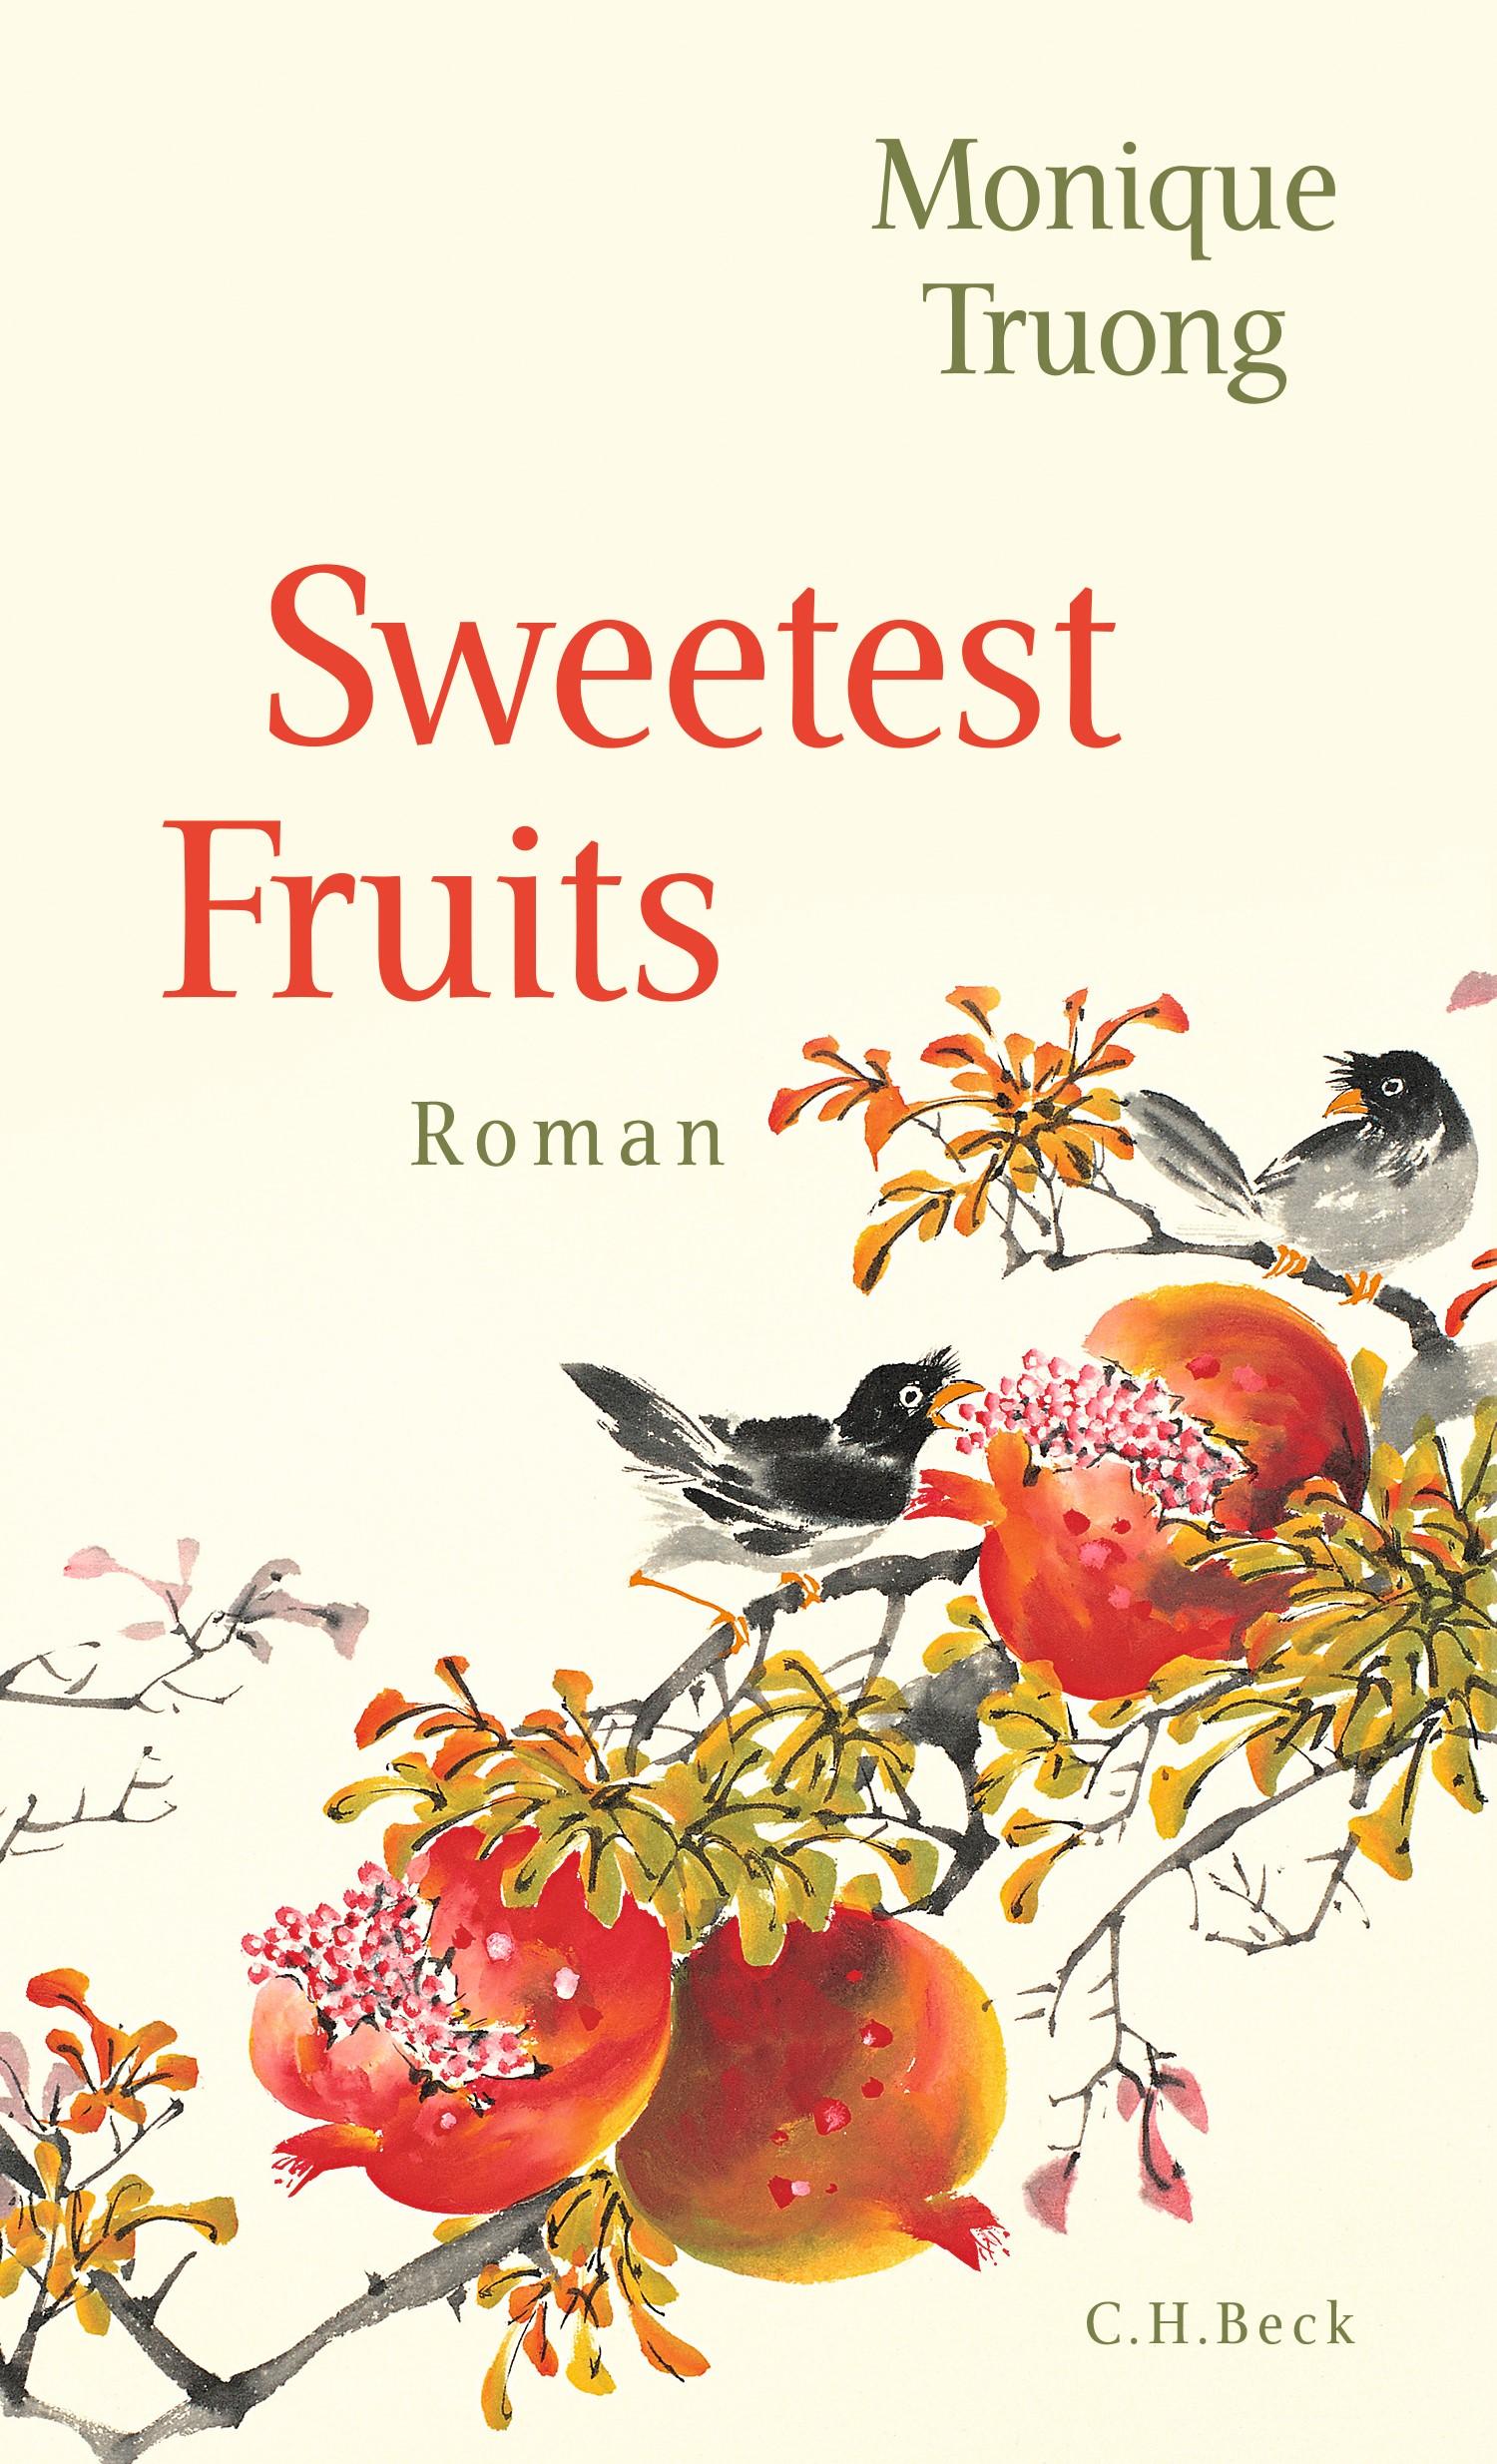 https://www.chbeck.de/truong-suesse-frucht/product/30250970